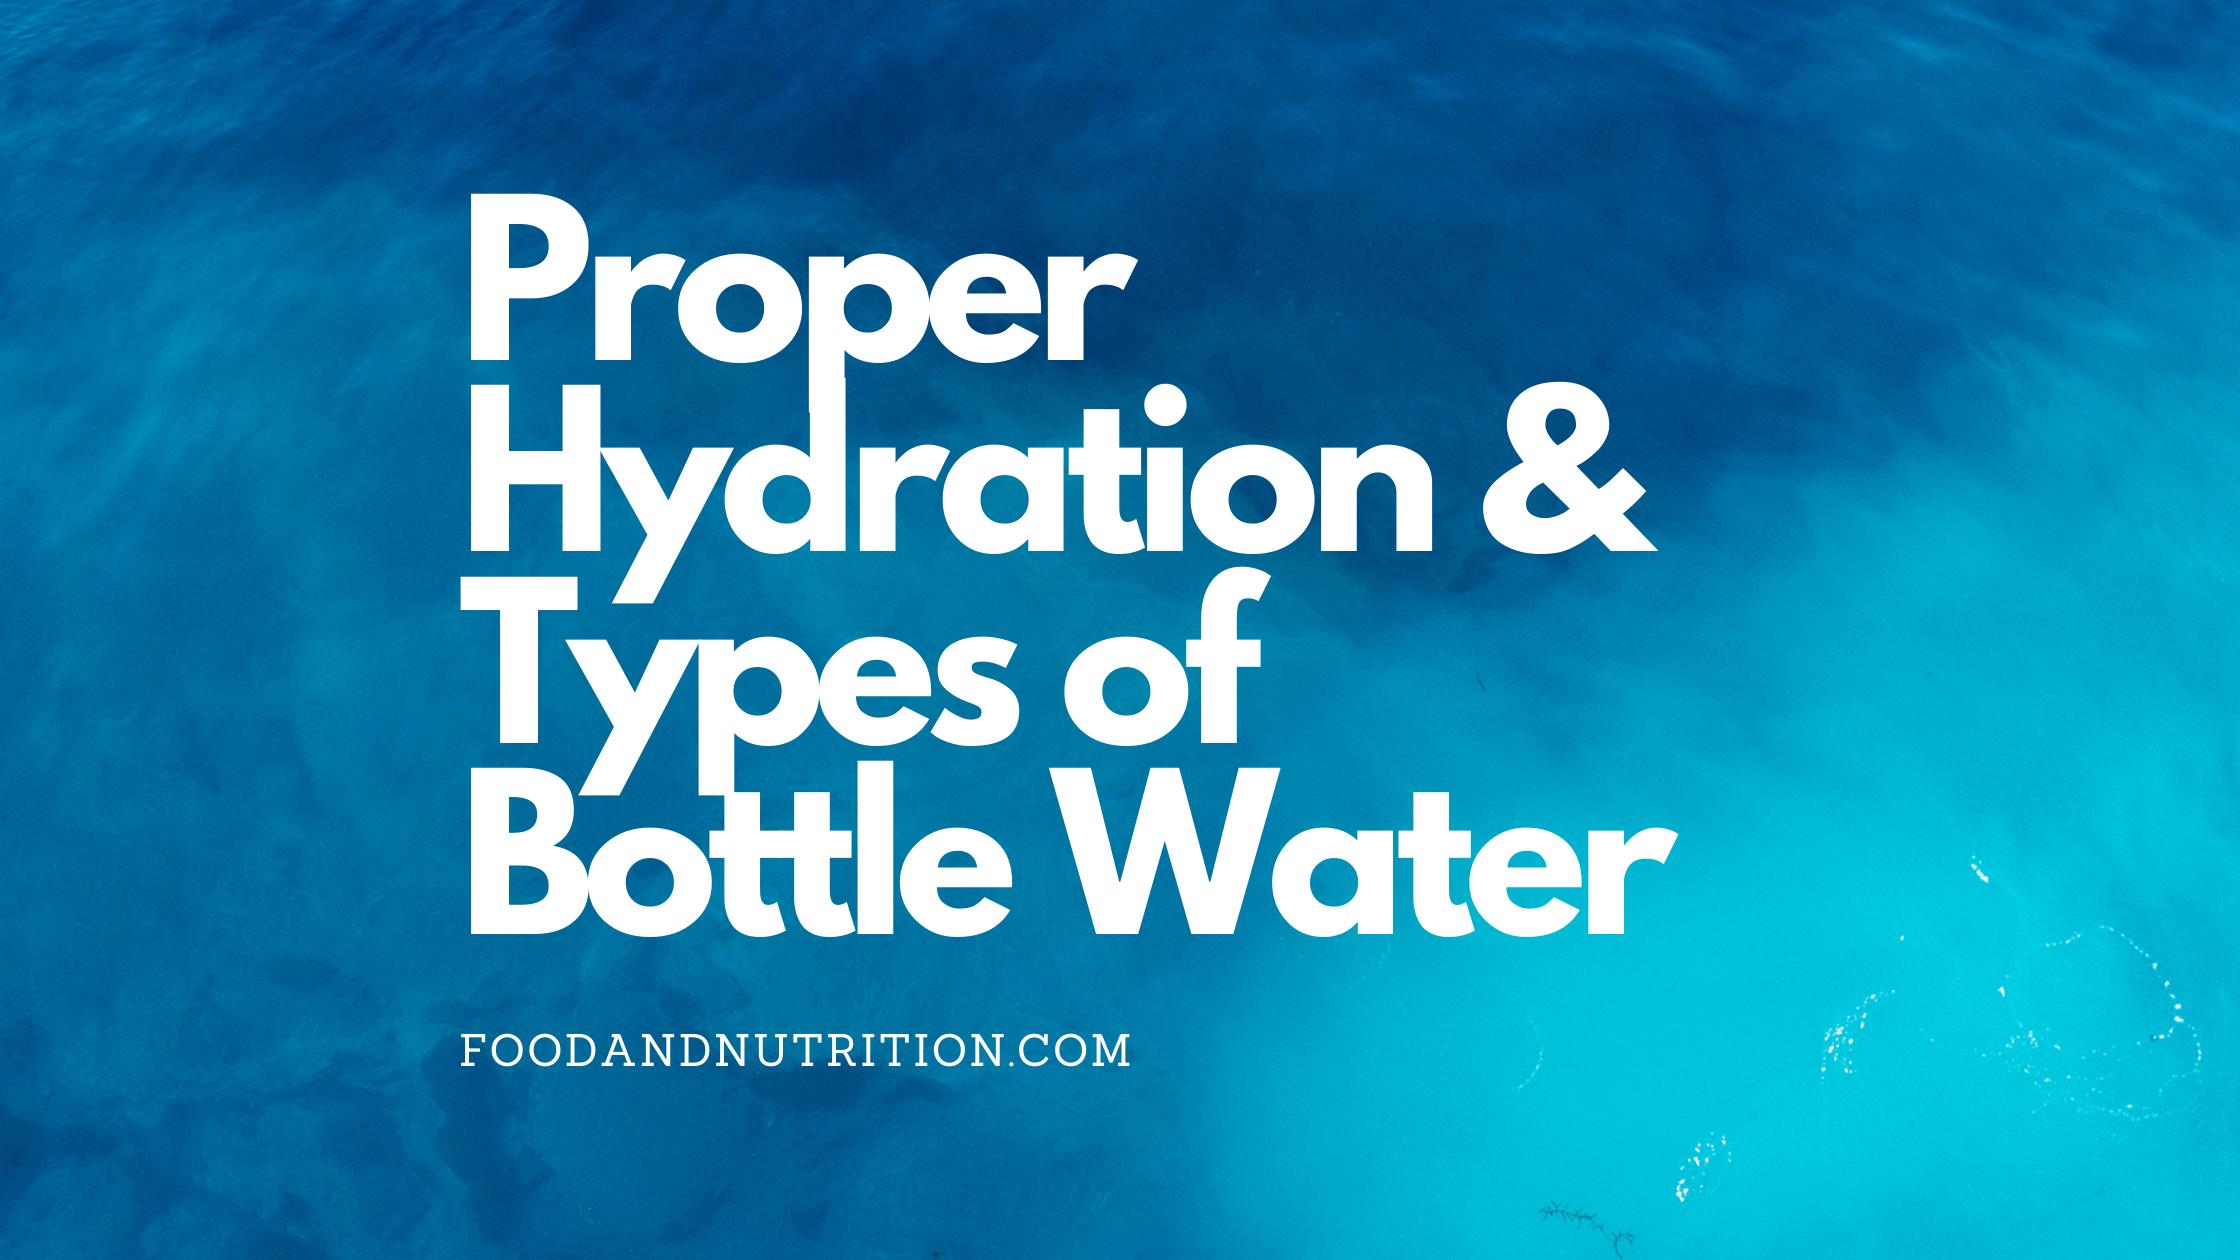 Proper Hydration & Types of Bottle Water